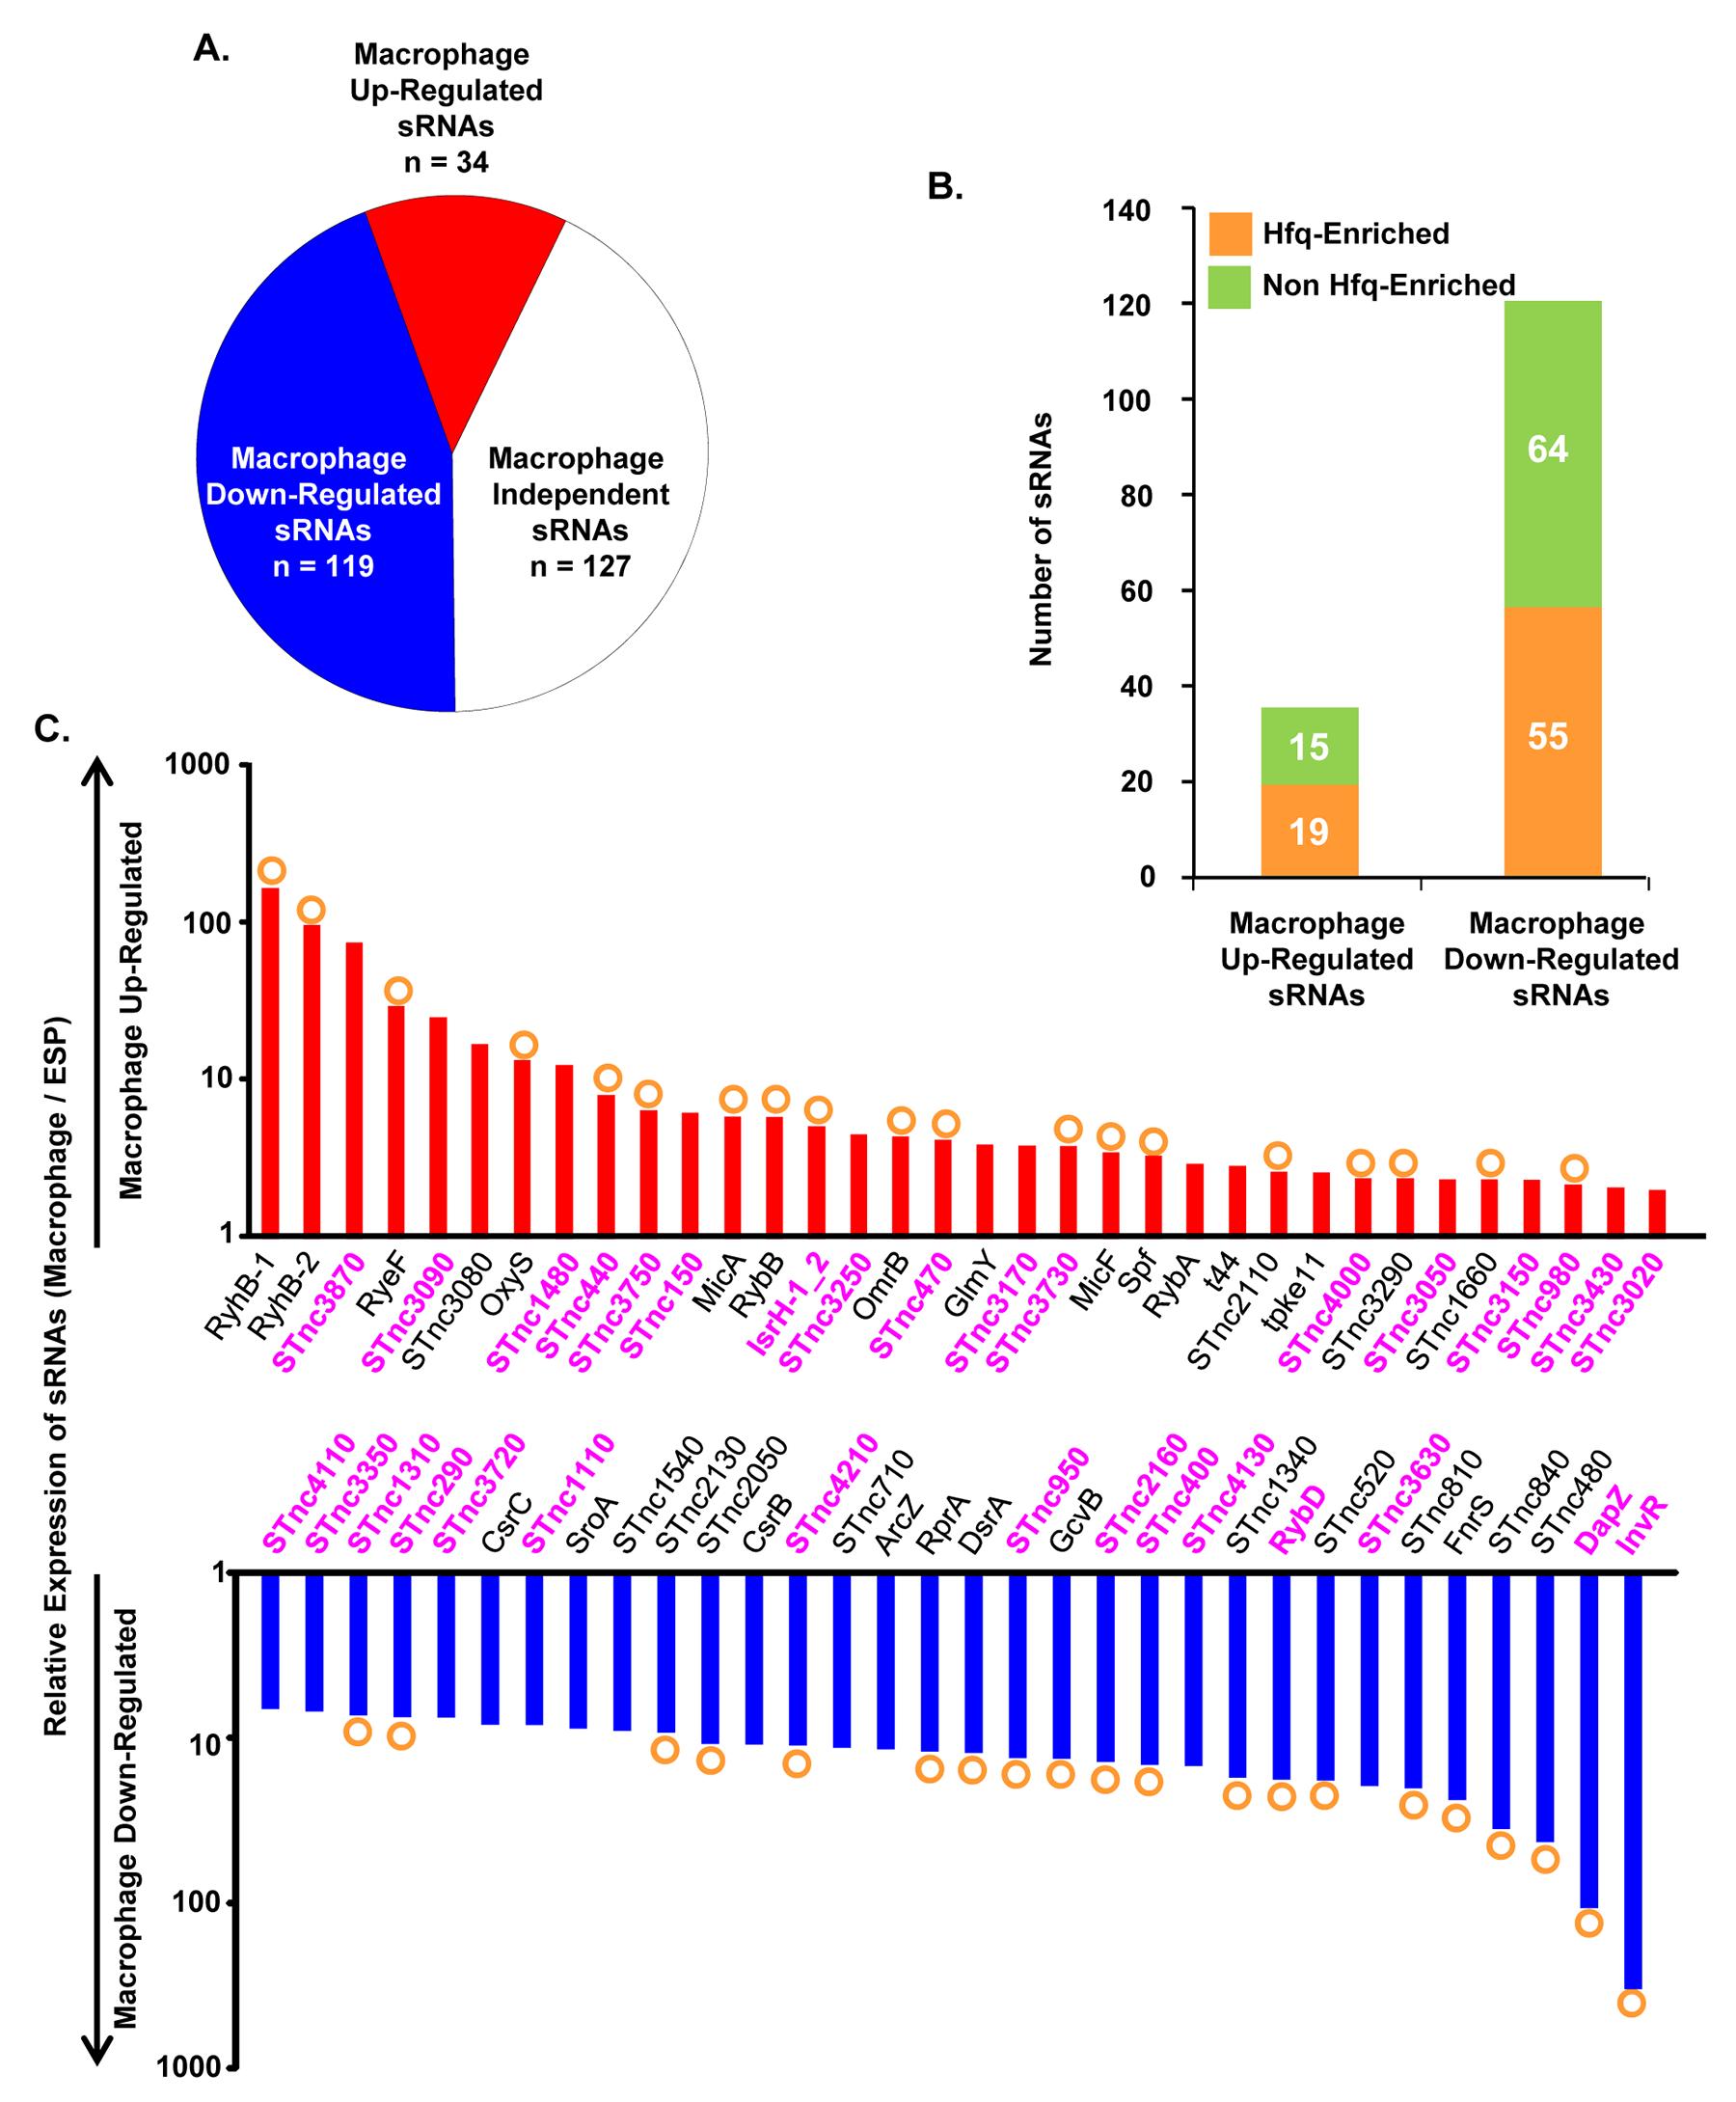 Intra-macrophage expression profile of <i>Salmonella</i> sRNAs.